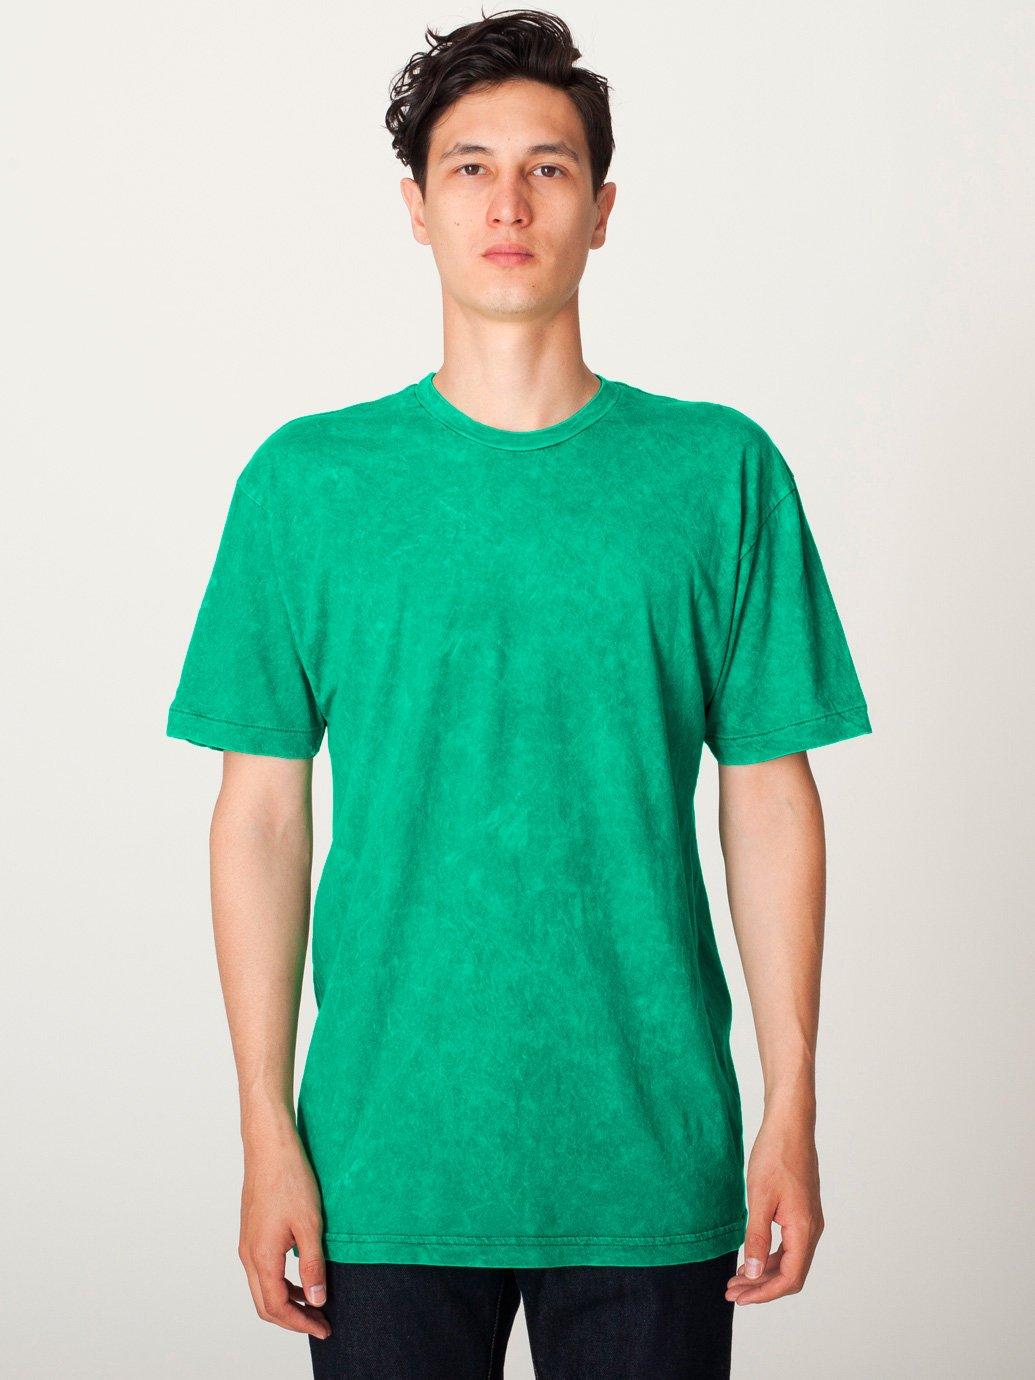 American apparel acid wash jersey short sleeve t shirt for American apparel fine jersey crewneck t shirt